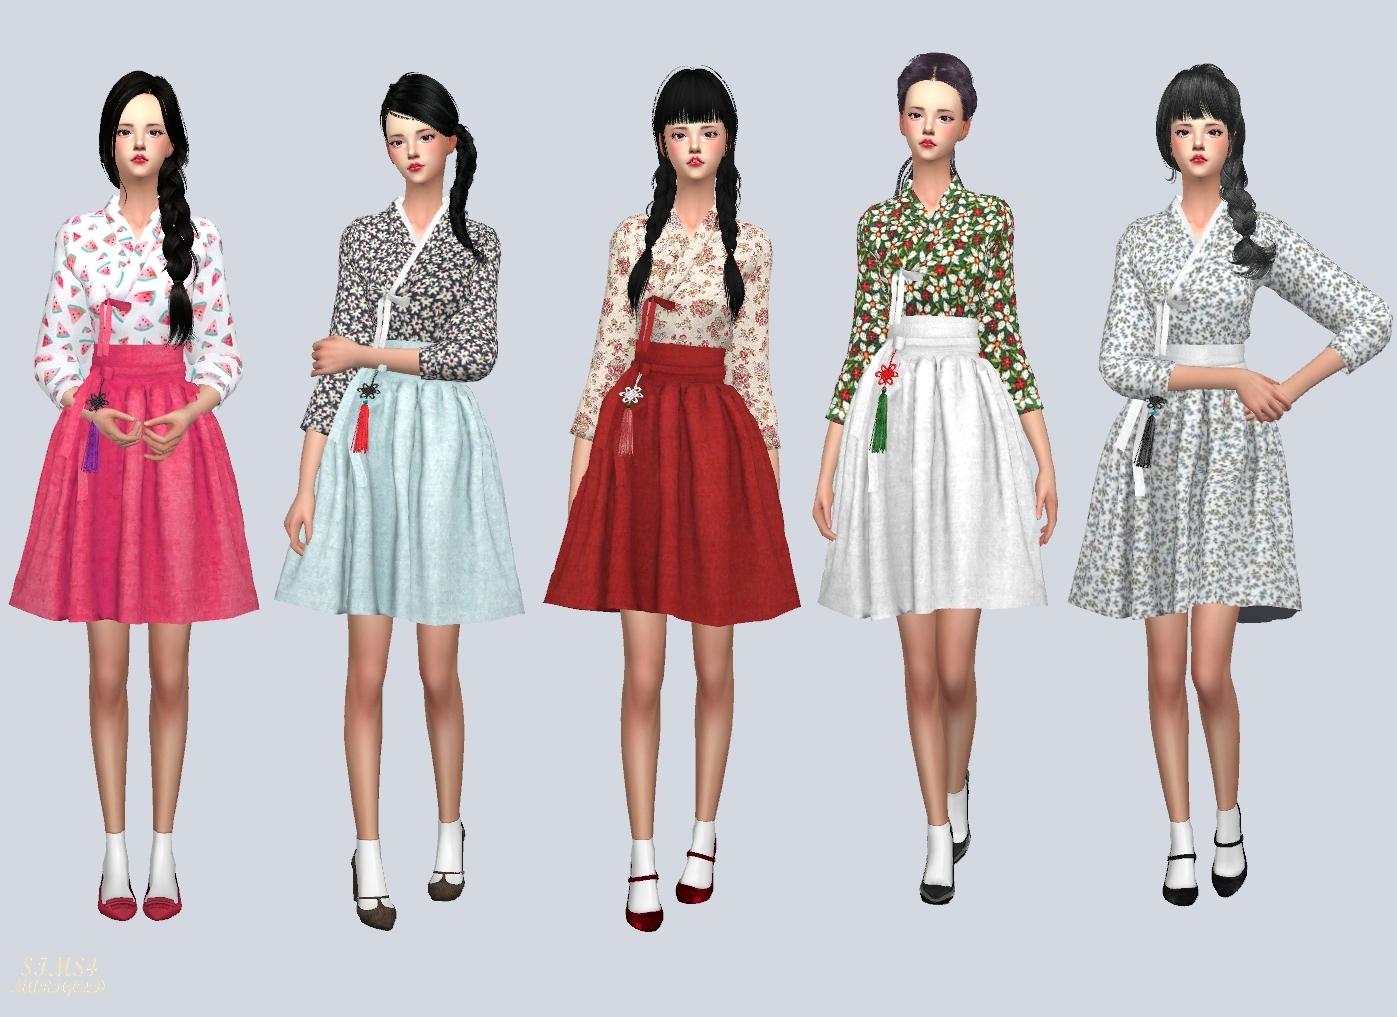 Casual Hanbok 생활 한복 여자 의상 Sims4 Marigold